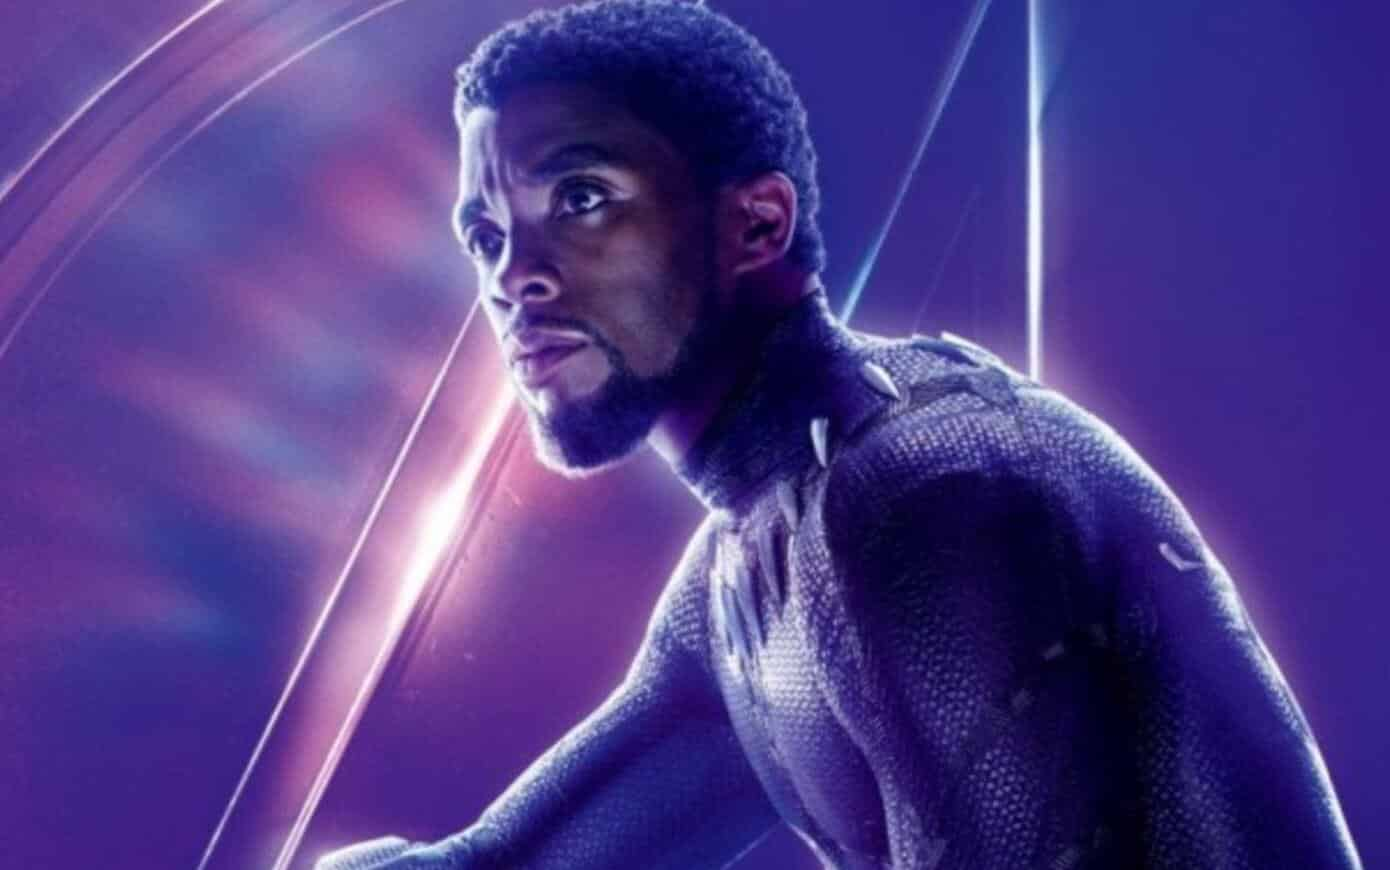 Avengers: Endgame Black Panther